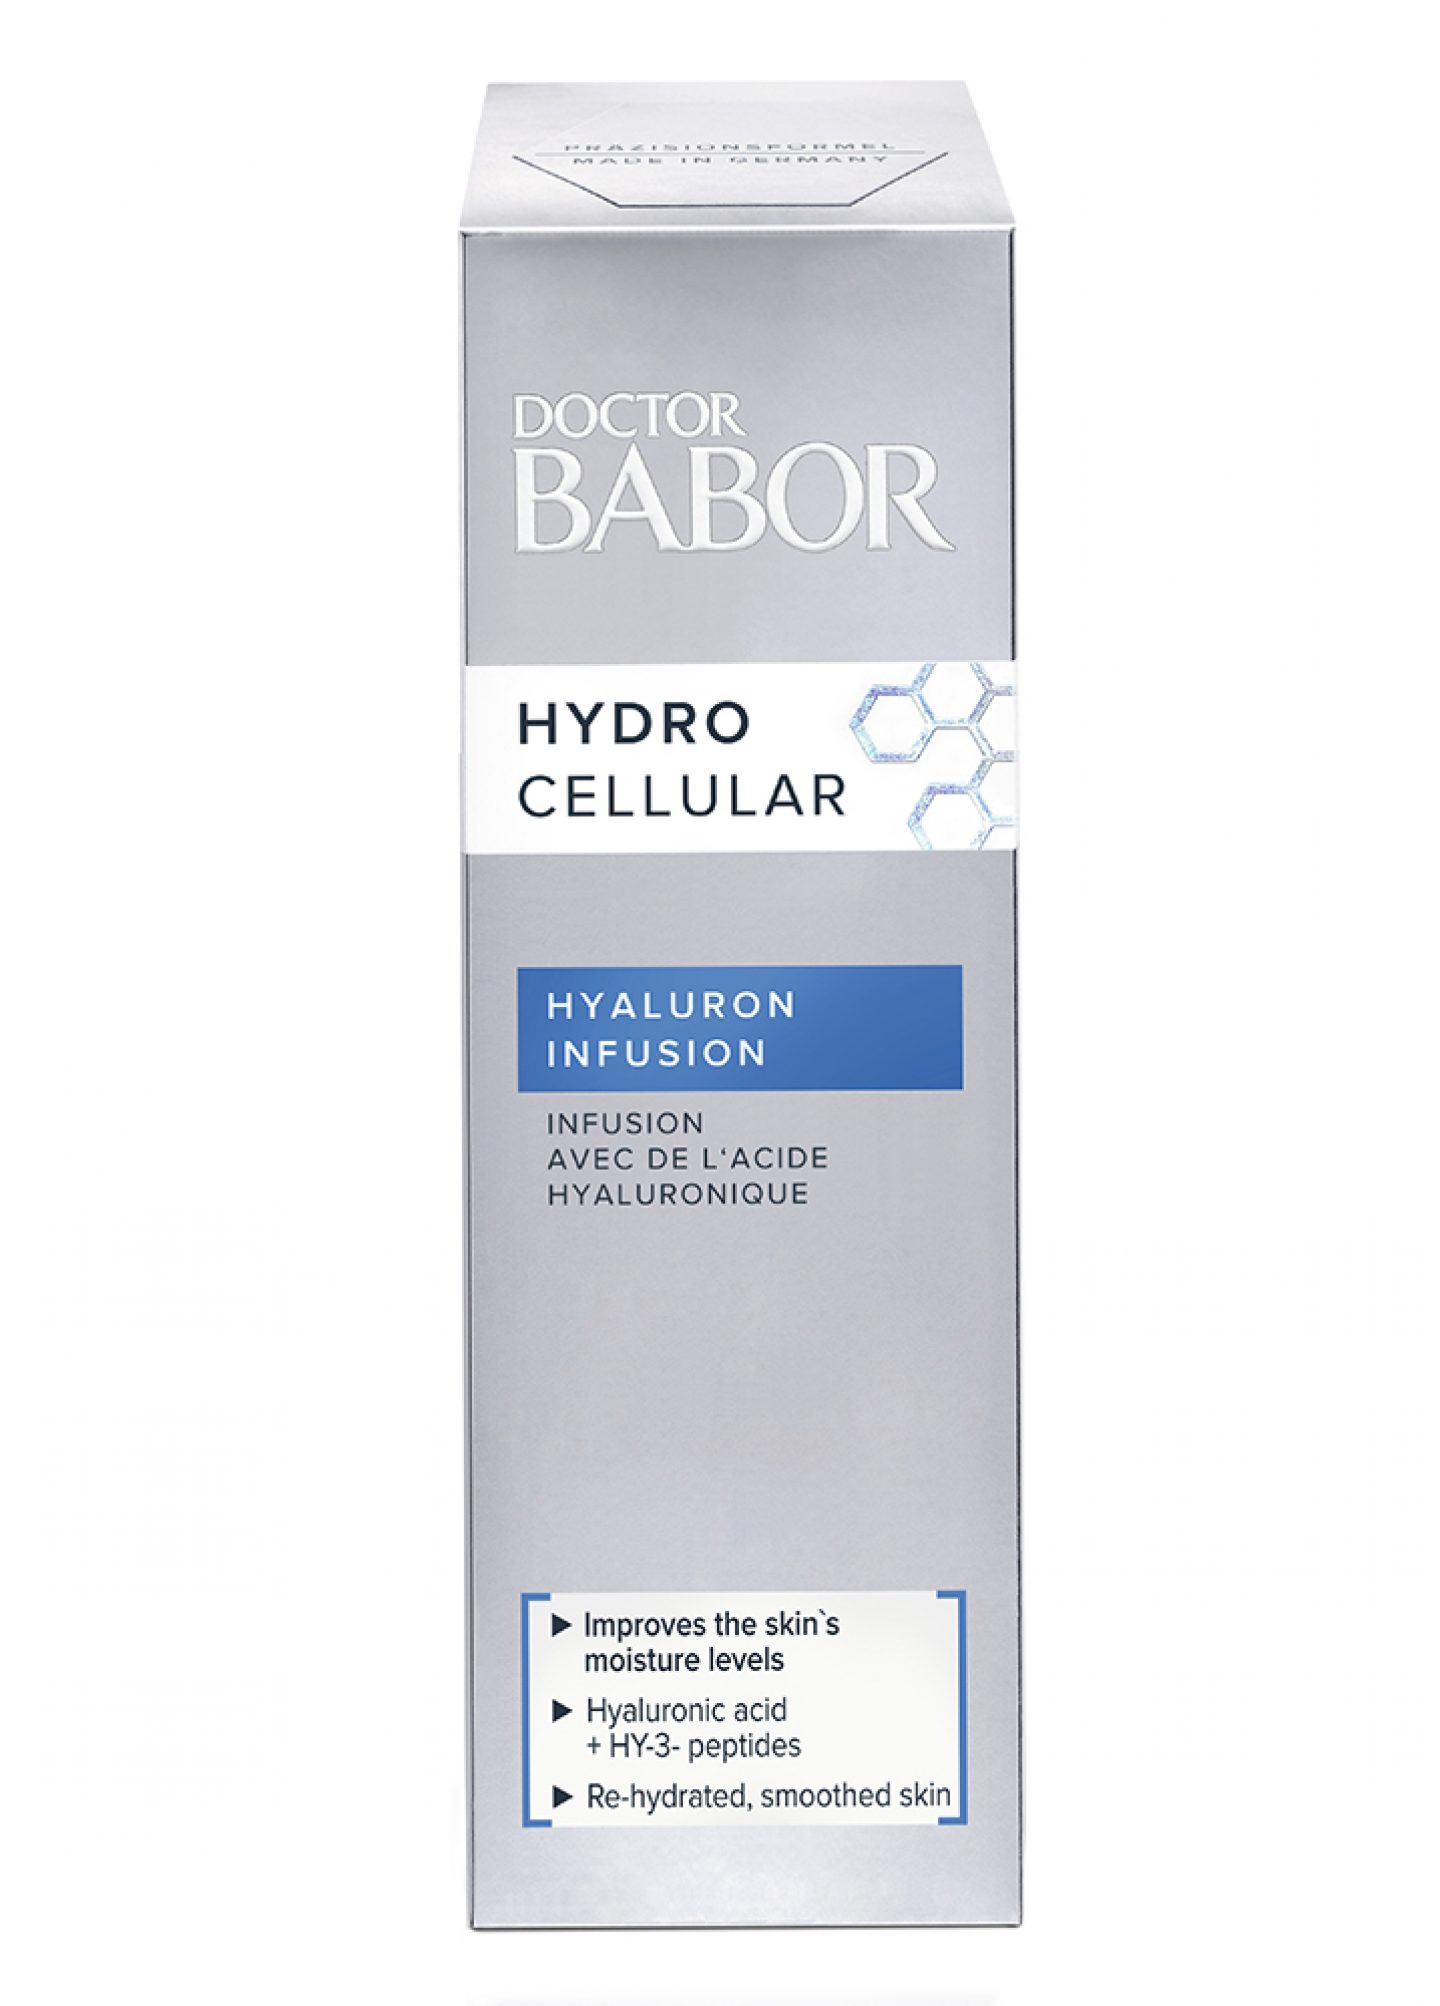 EEZ-Apotheke Kosmetik Feuchtigkeitspflege Doctor Babor Hyaluron Infusion